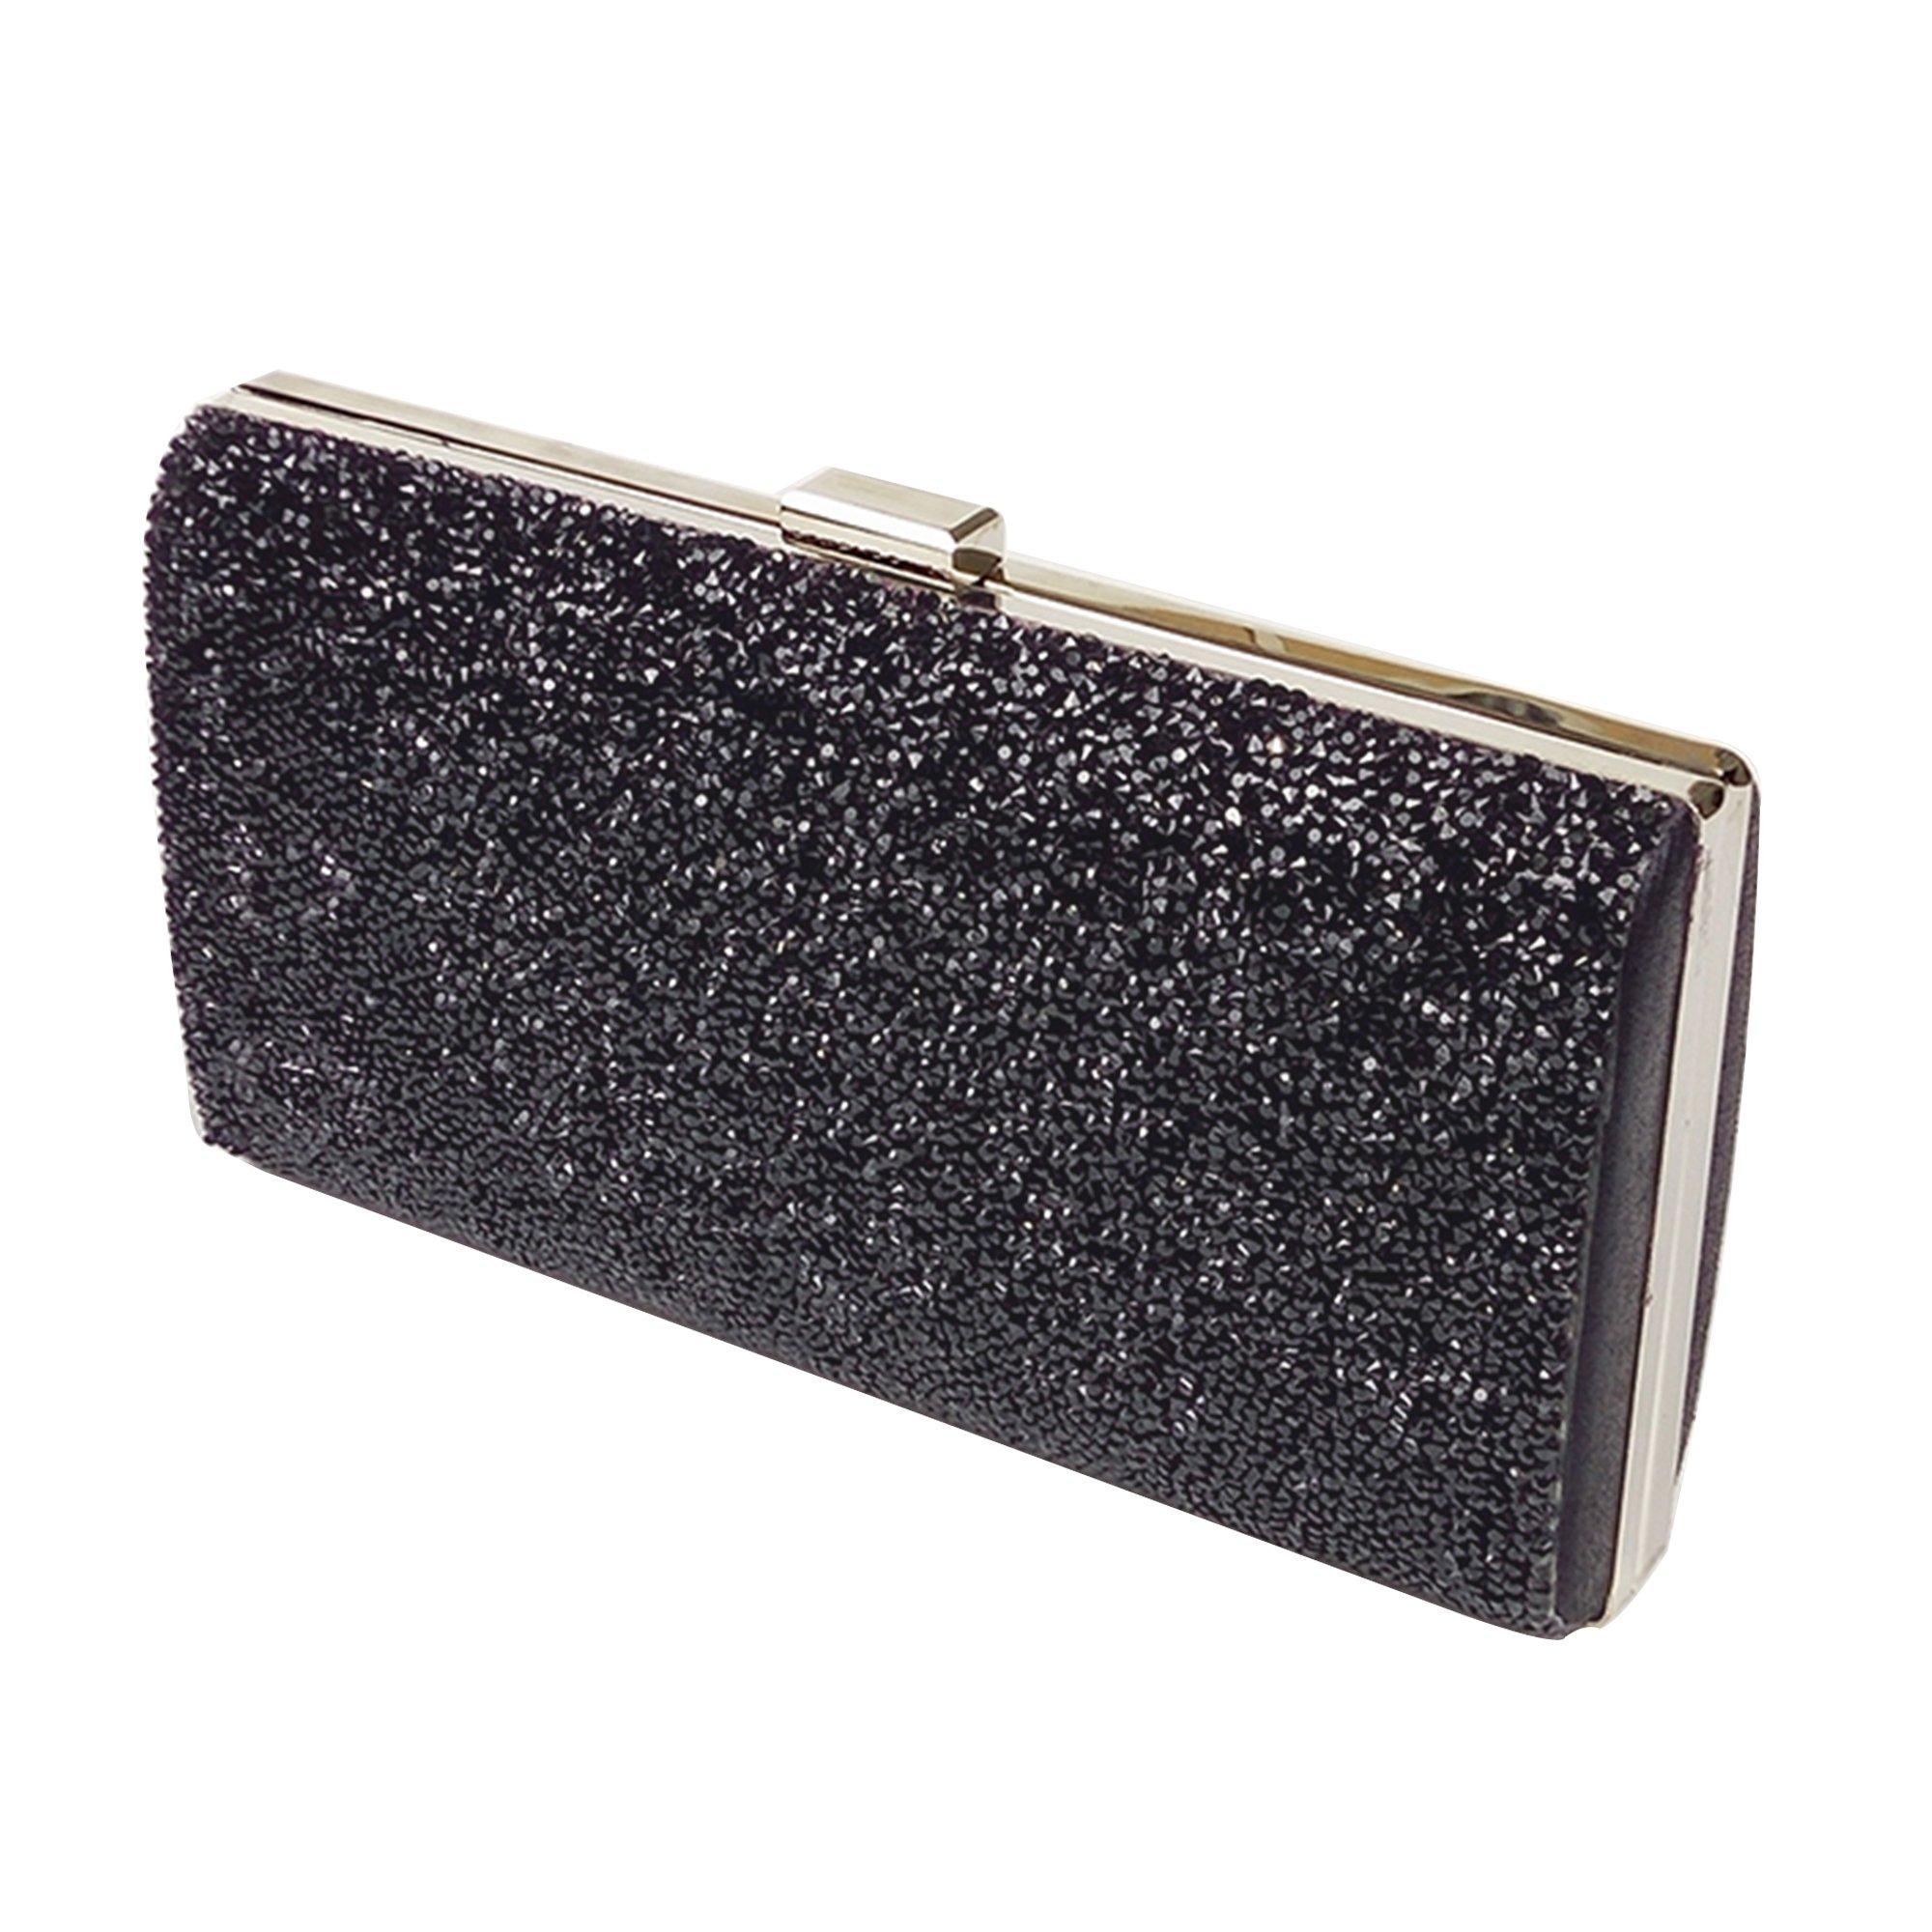 ChilMo Ladies Rhinestone Clutch Purse, Sparkling Evening Handbags For Wedding Prom Bride,Black